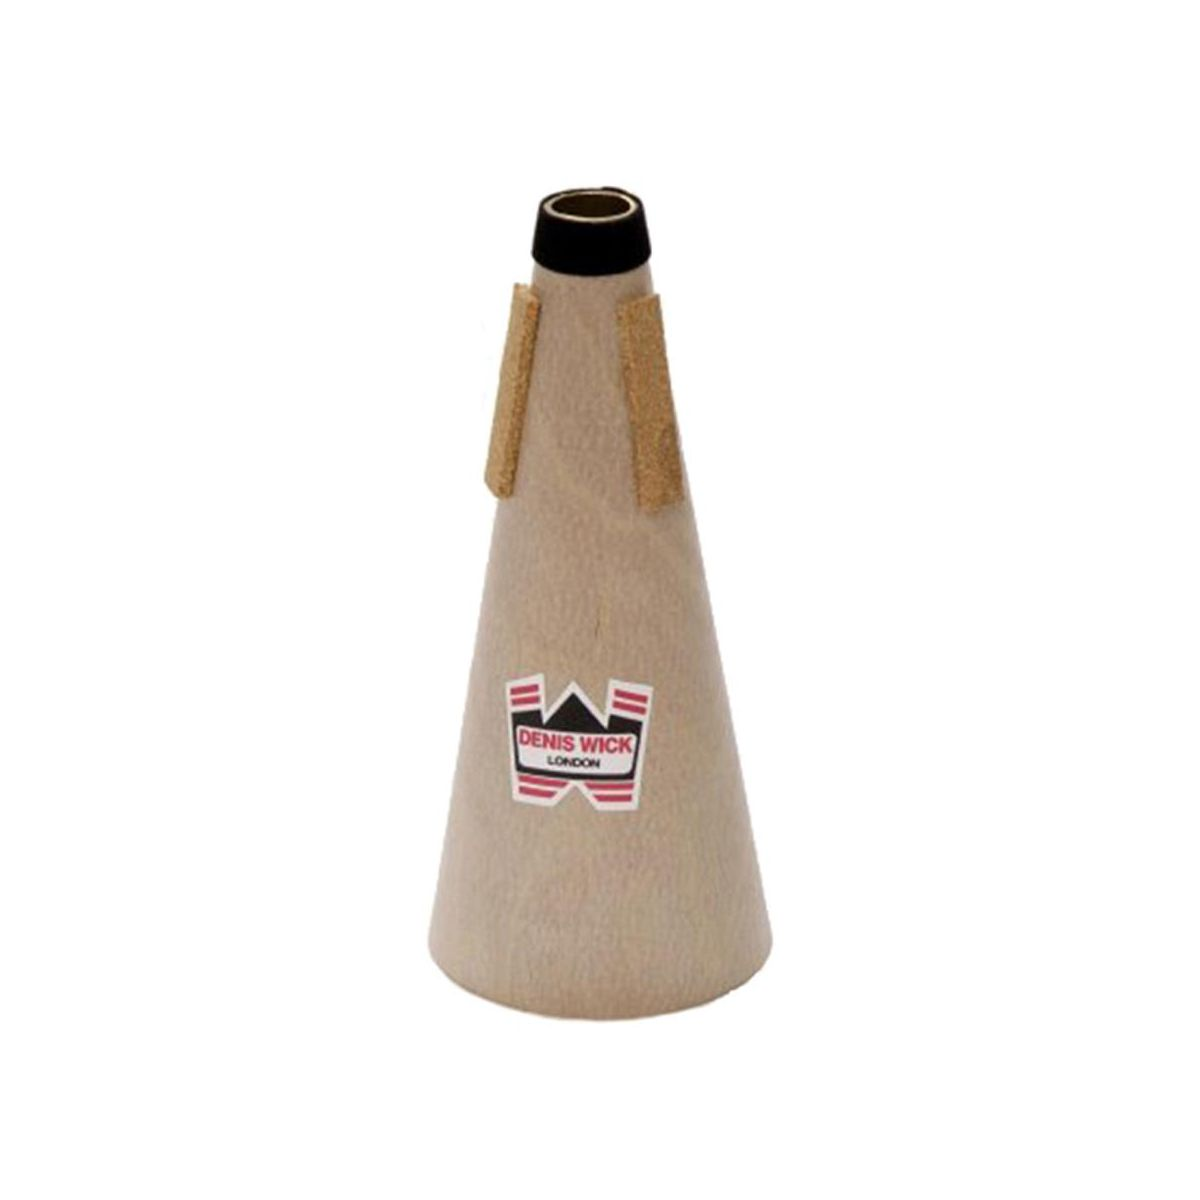 Sordina Tromba Denis Wick DW5551 Straight in legno